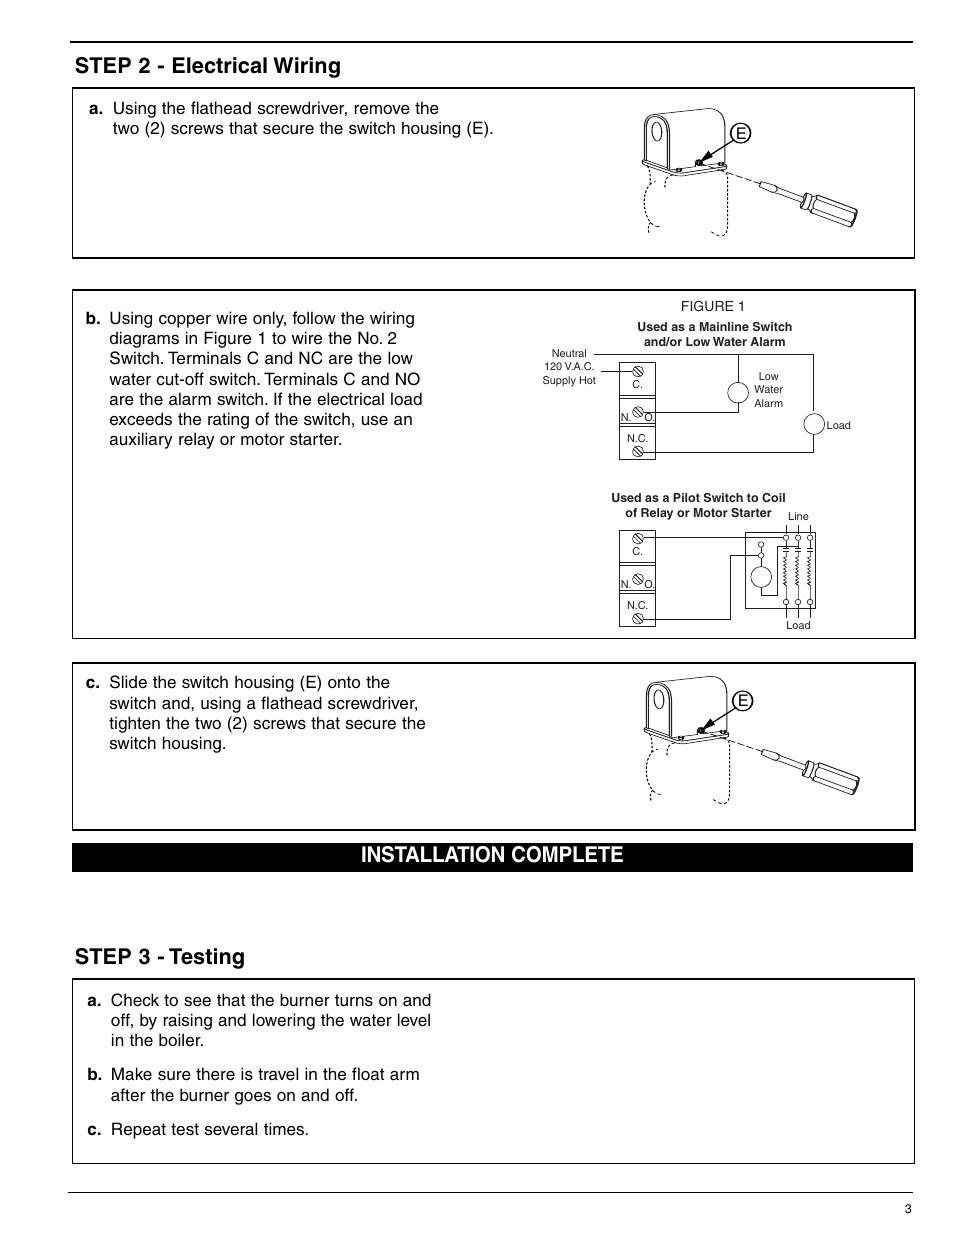 Mcdonnell & miller, Maintenance, Step 4 - switch adjustment | Xylem on